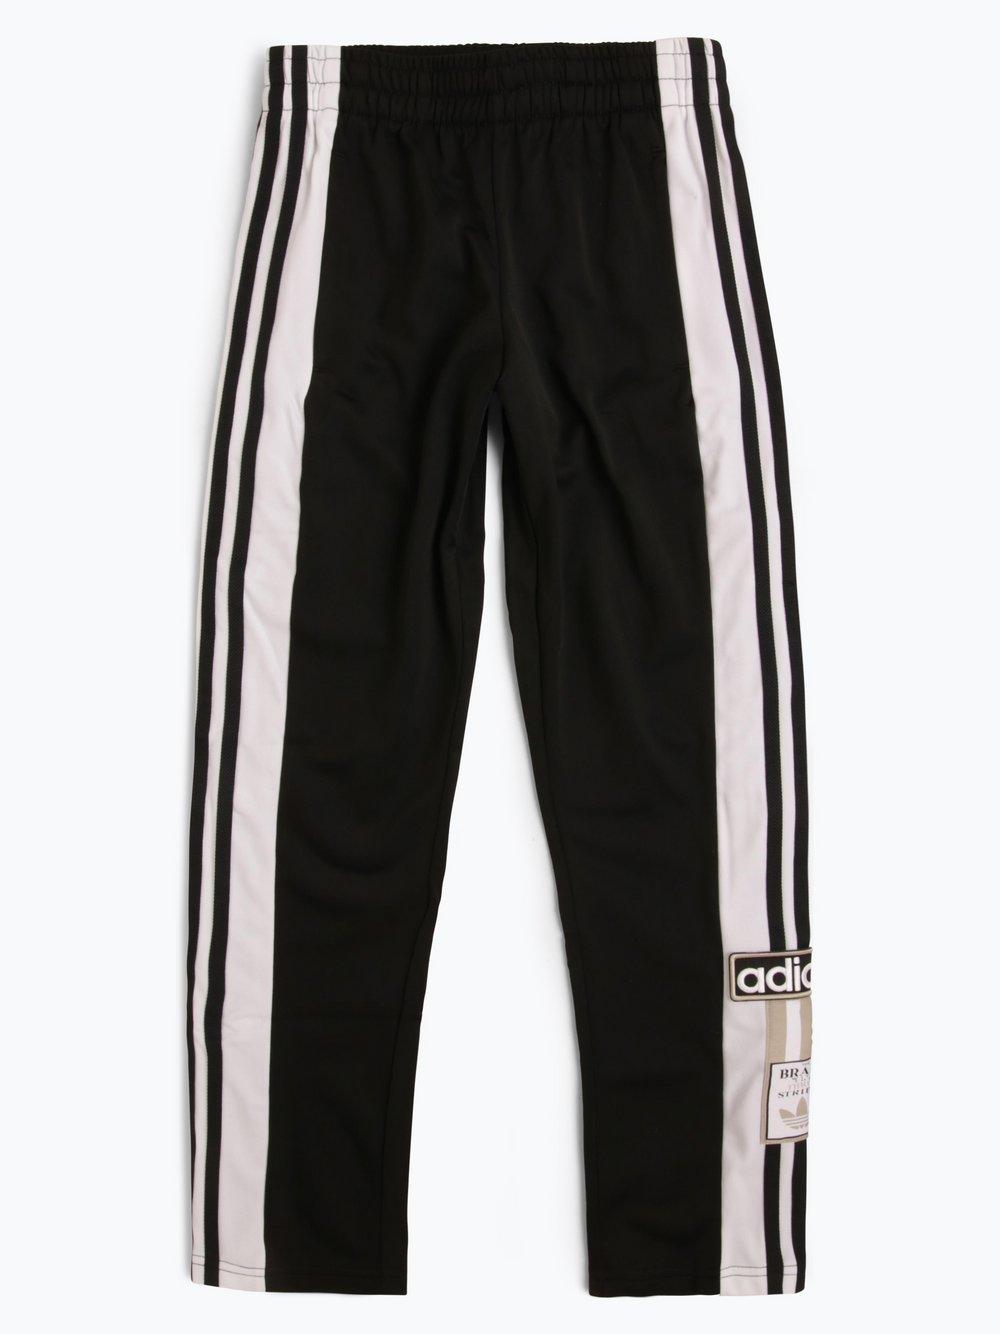 mädchen jogginghose adidas